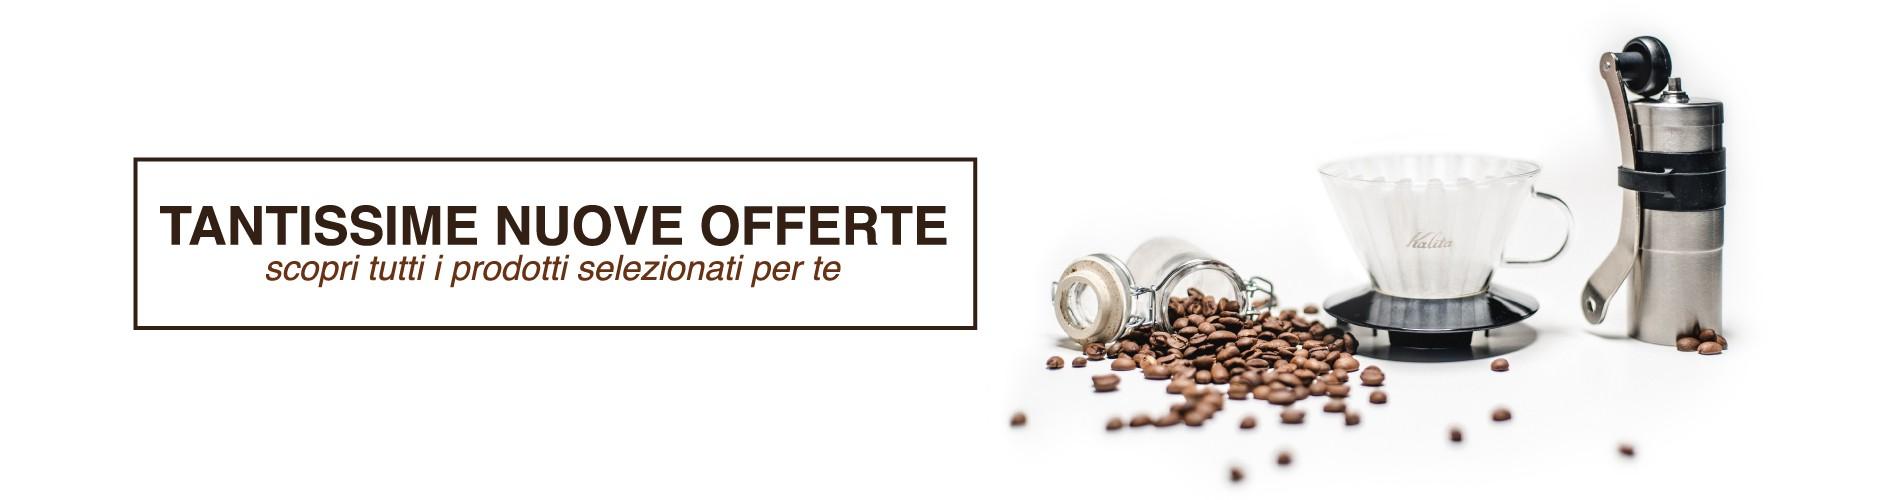 offerte-caffe